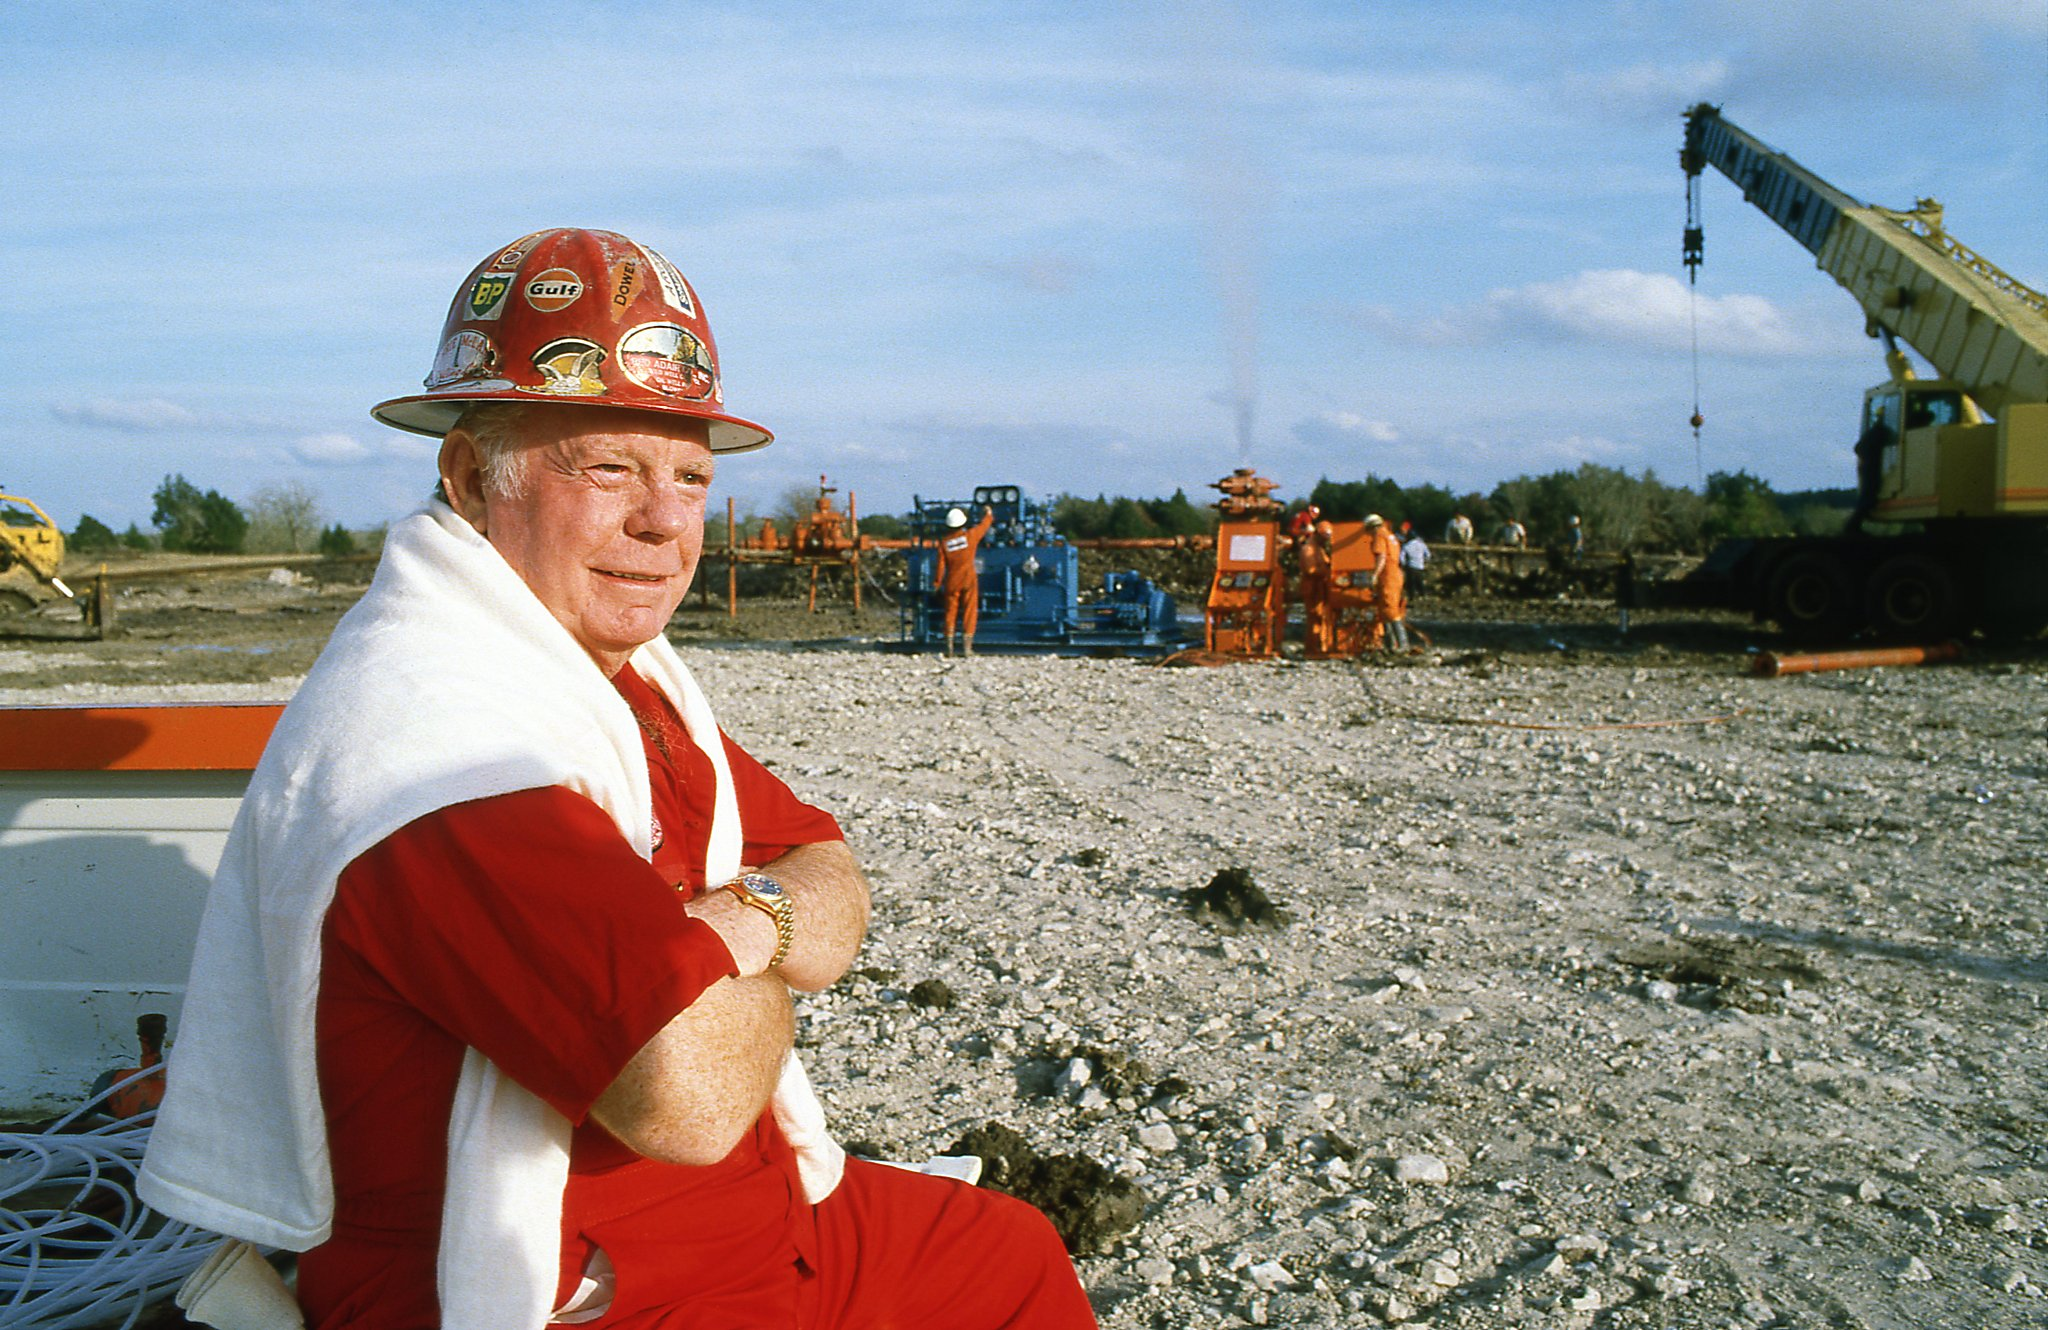 Send for Red Adair!': Deer Park blaze stokes memories of famed ...